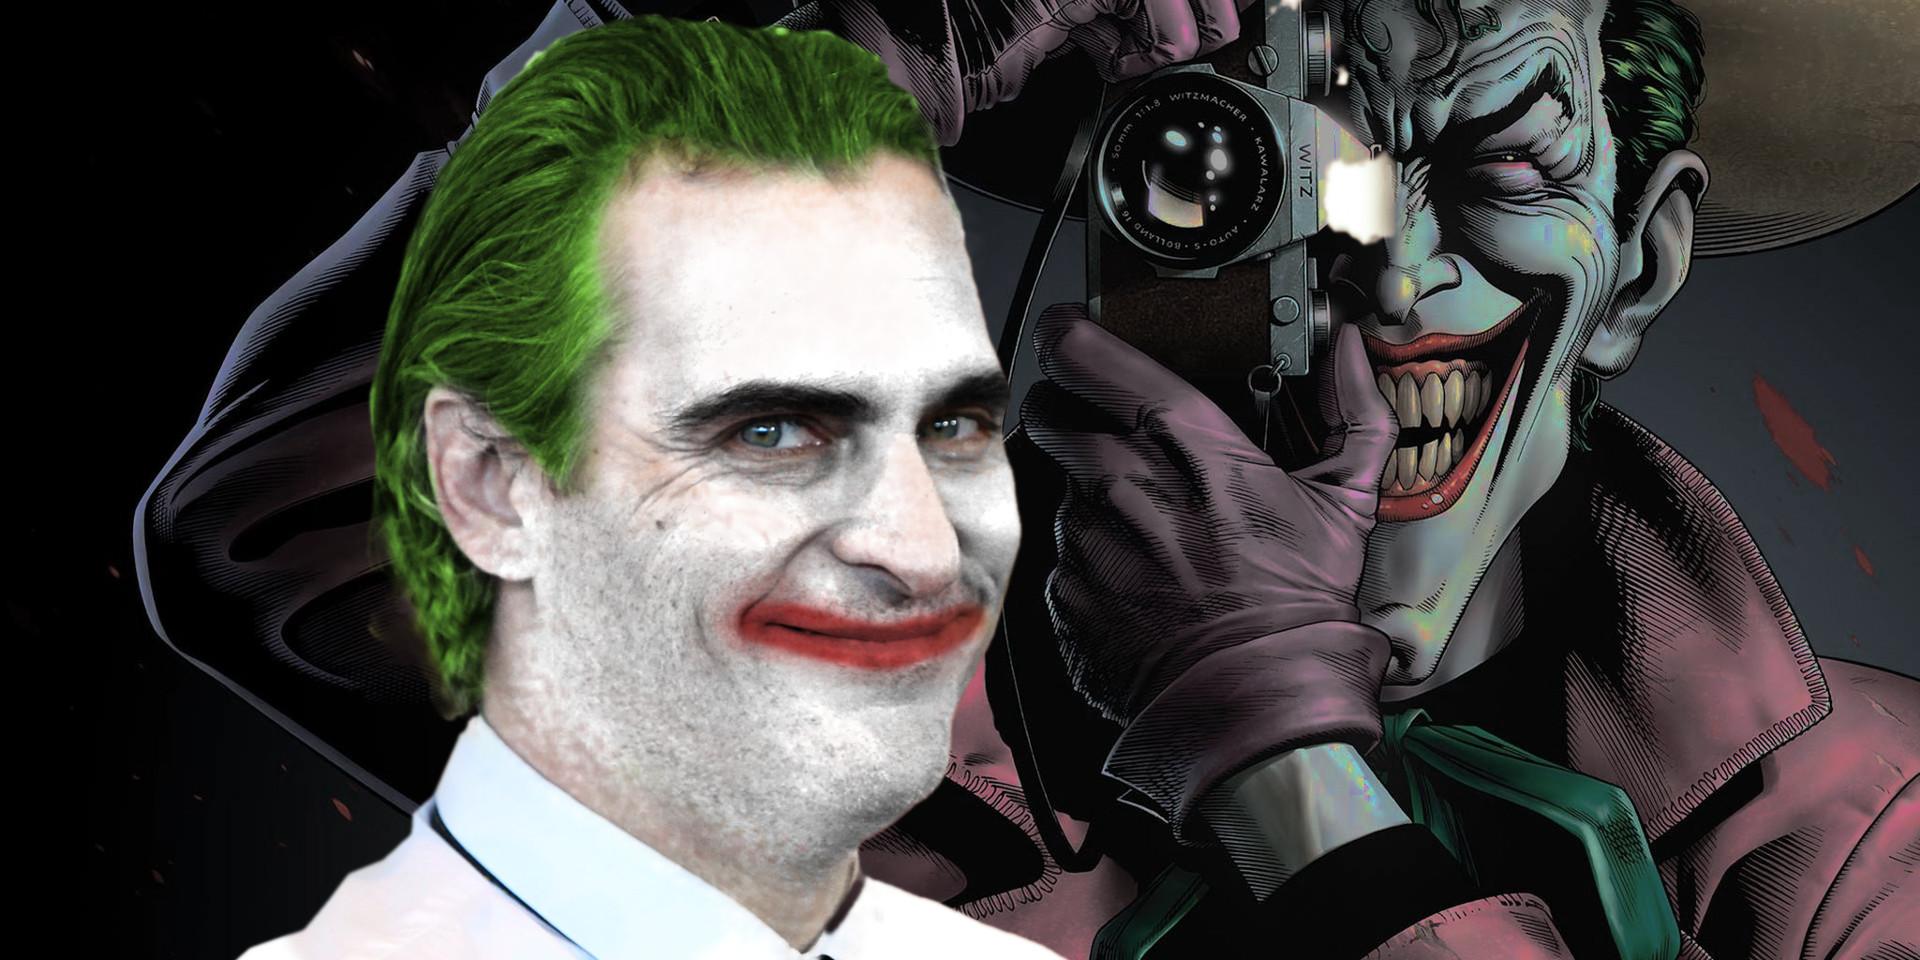 Joaquin Phoenix Joker Movie May Start Filming In September